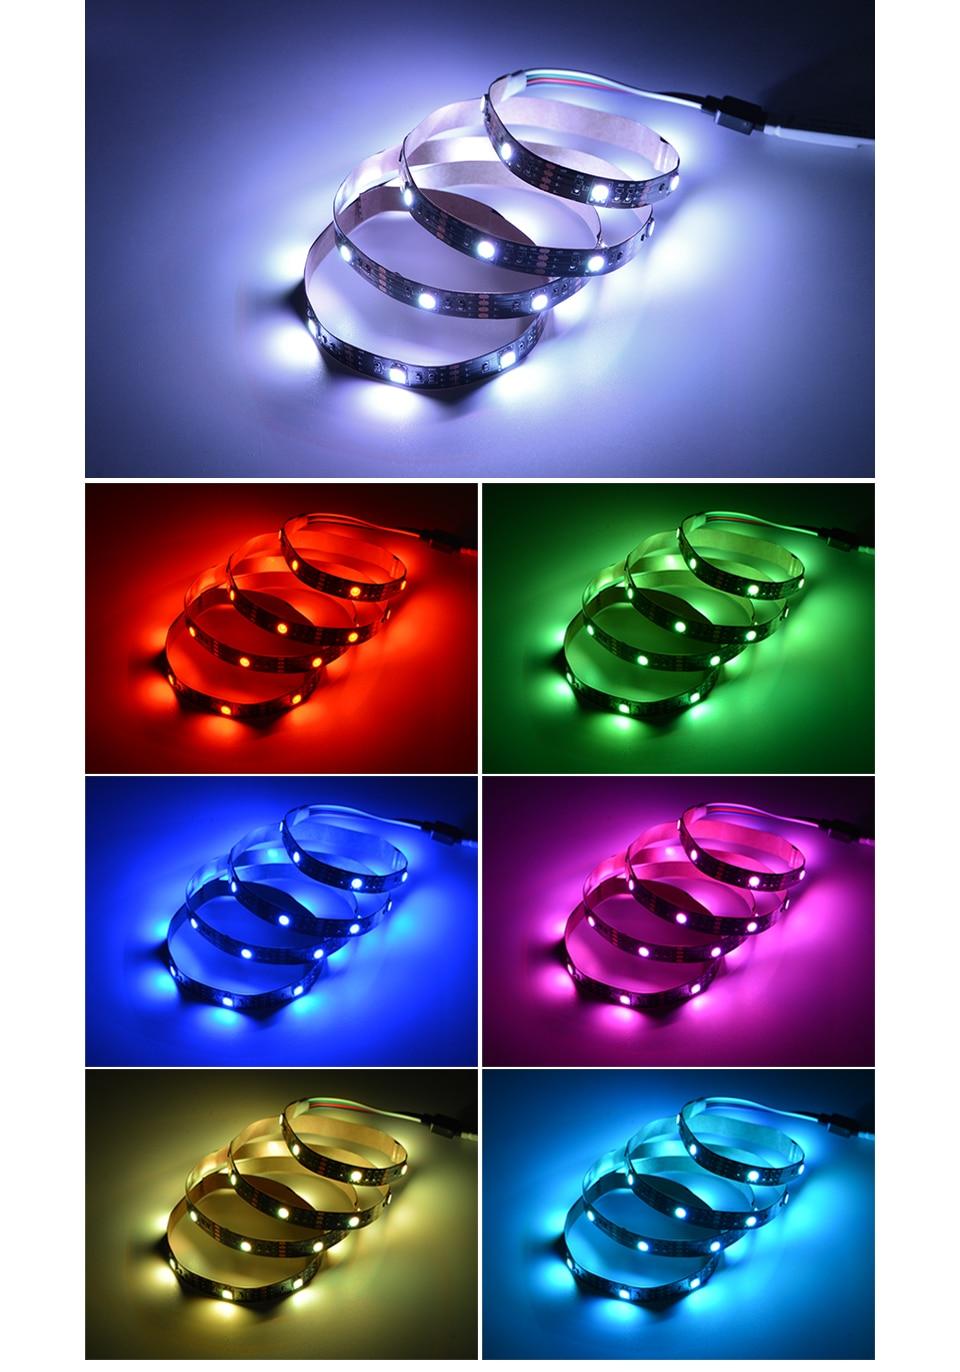 HTB1gSVAaMb.PuJjSZFpq6zuFpXaD TV Backlight RGB LED Strip 5050 Waterproof 5V USB LED Tape String Bias lighting For HDTV Screen Desktop PC LCD Monitor Decor